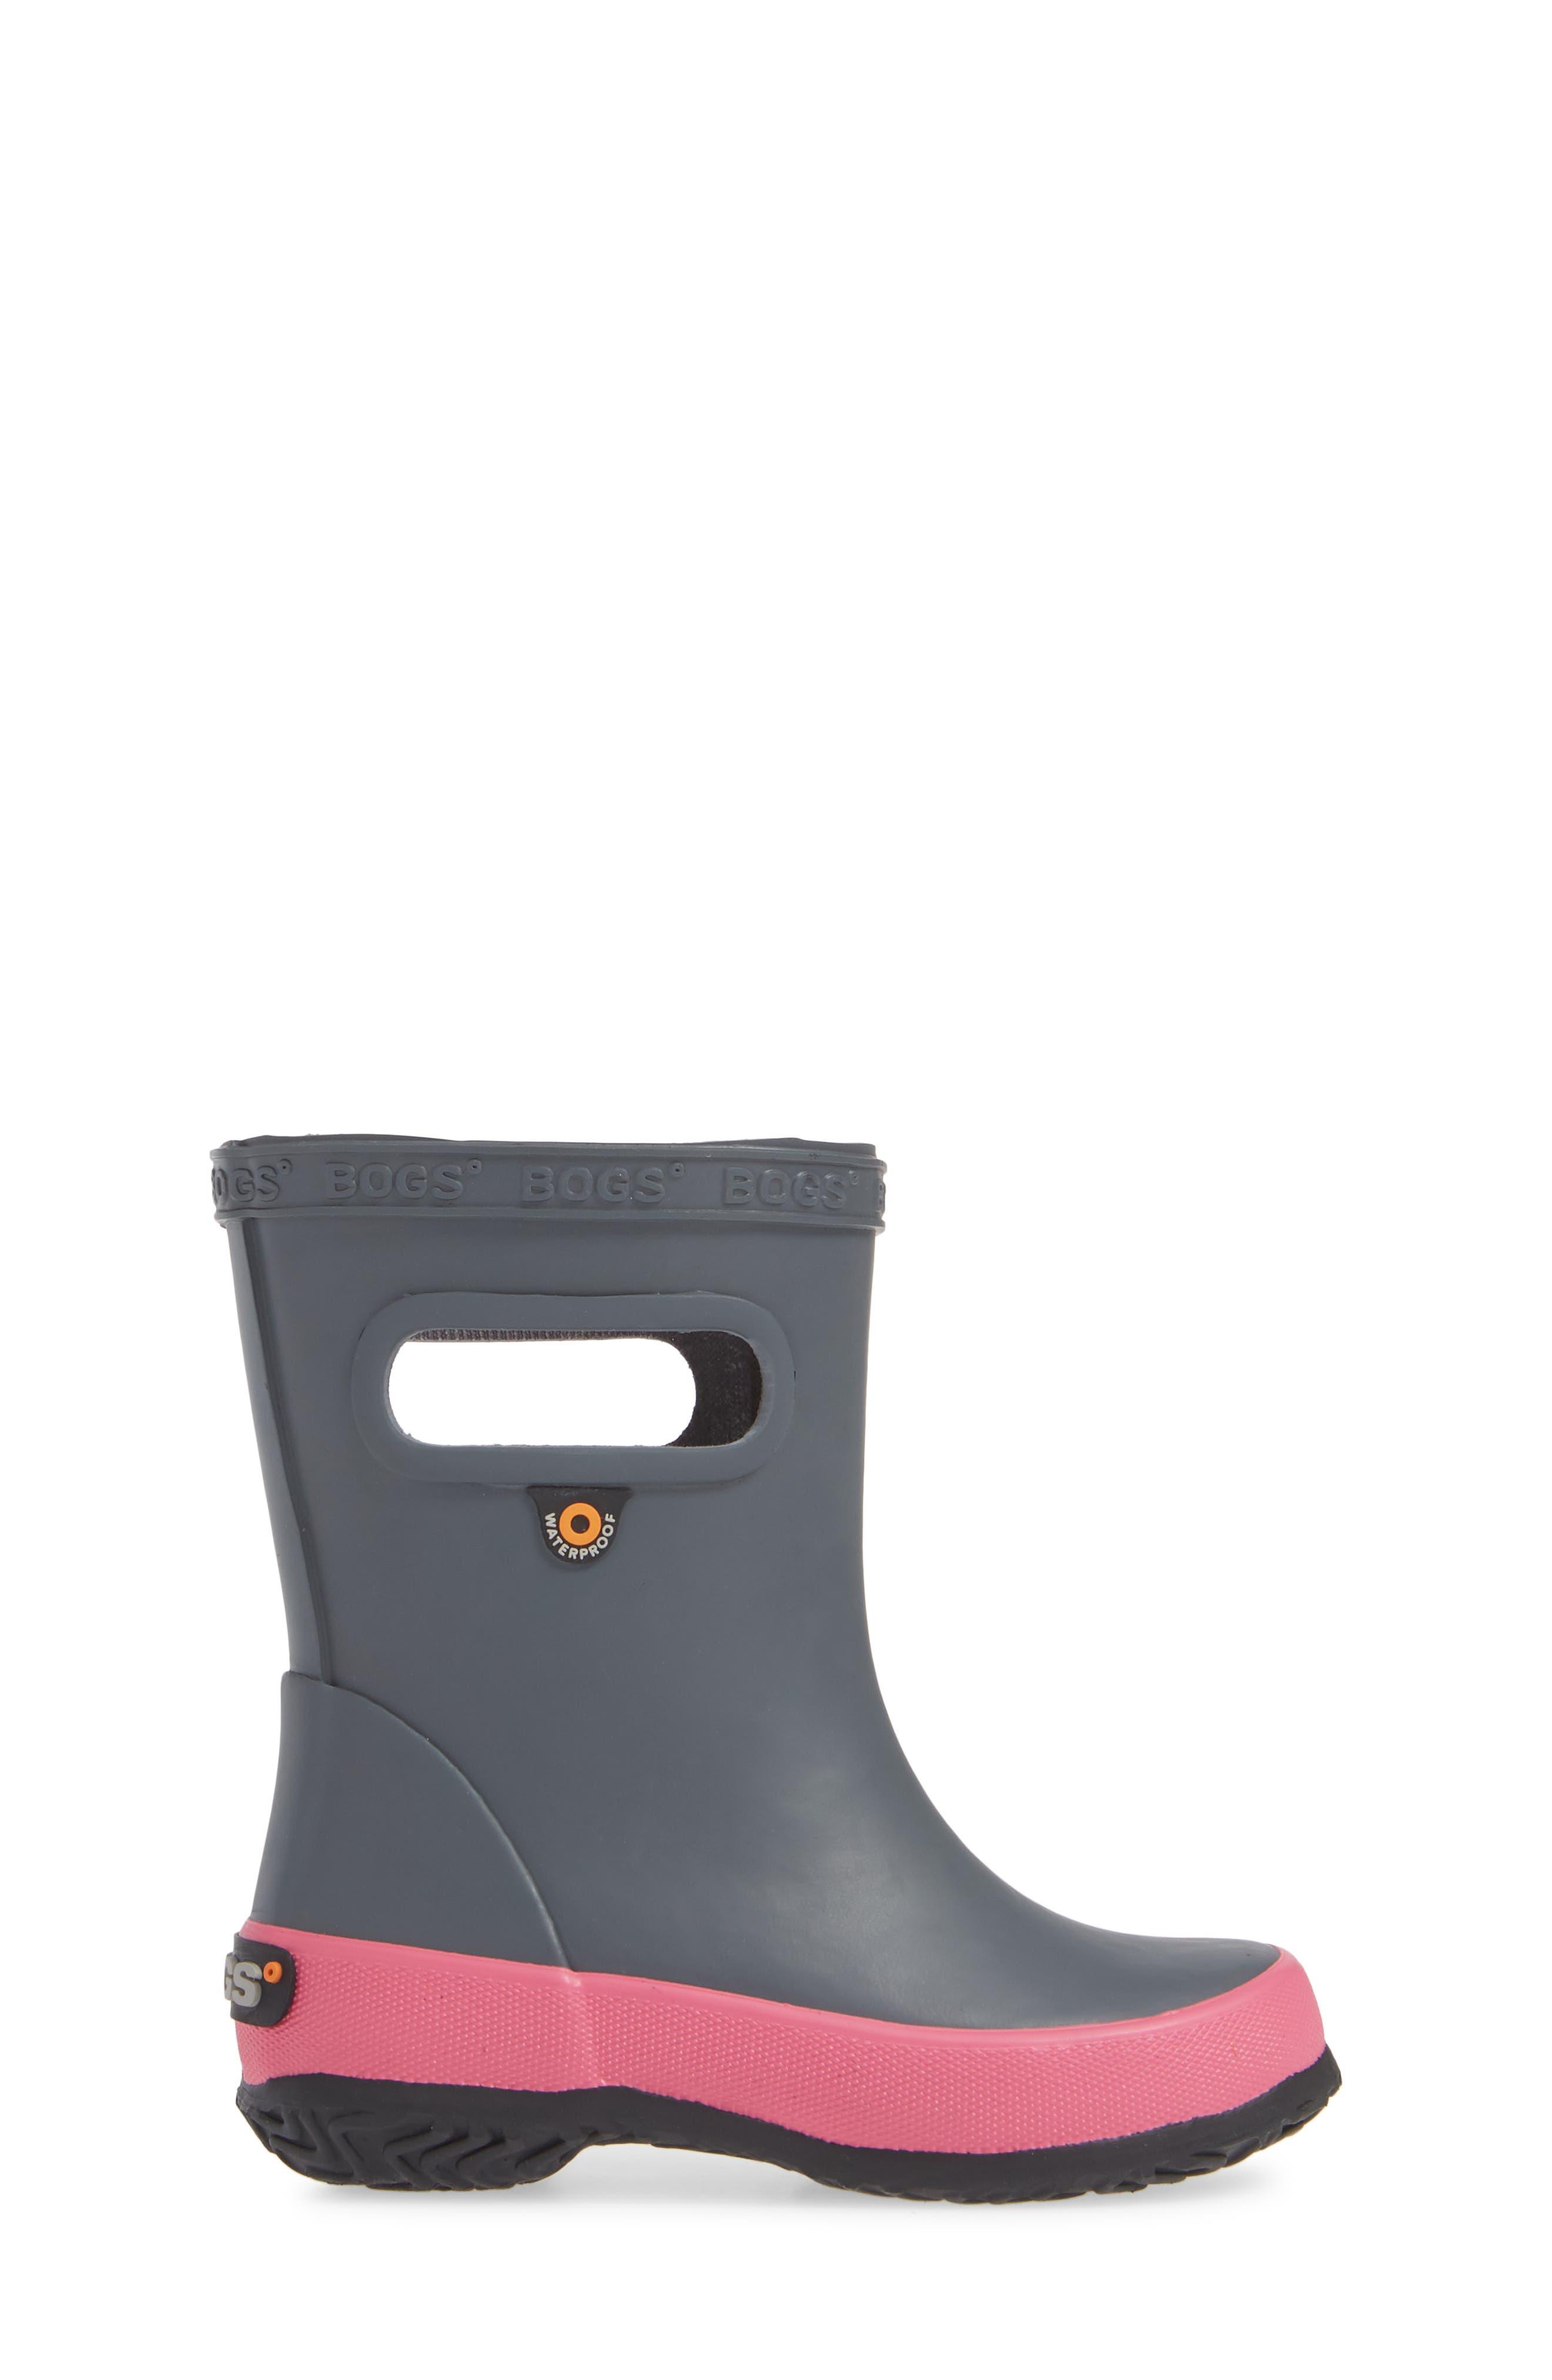 Skipper Solid Rubber Rain Boot,                             Alternate thumbnail 3, color,                             DARK GRAY